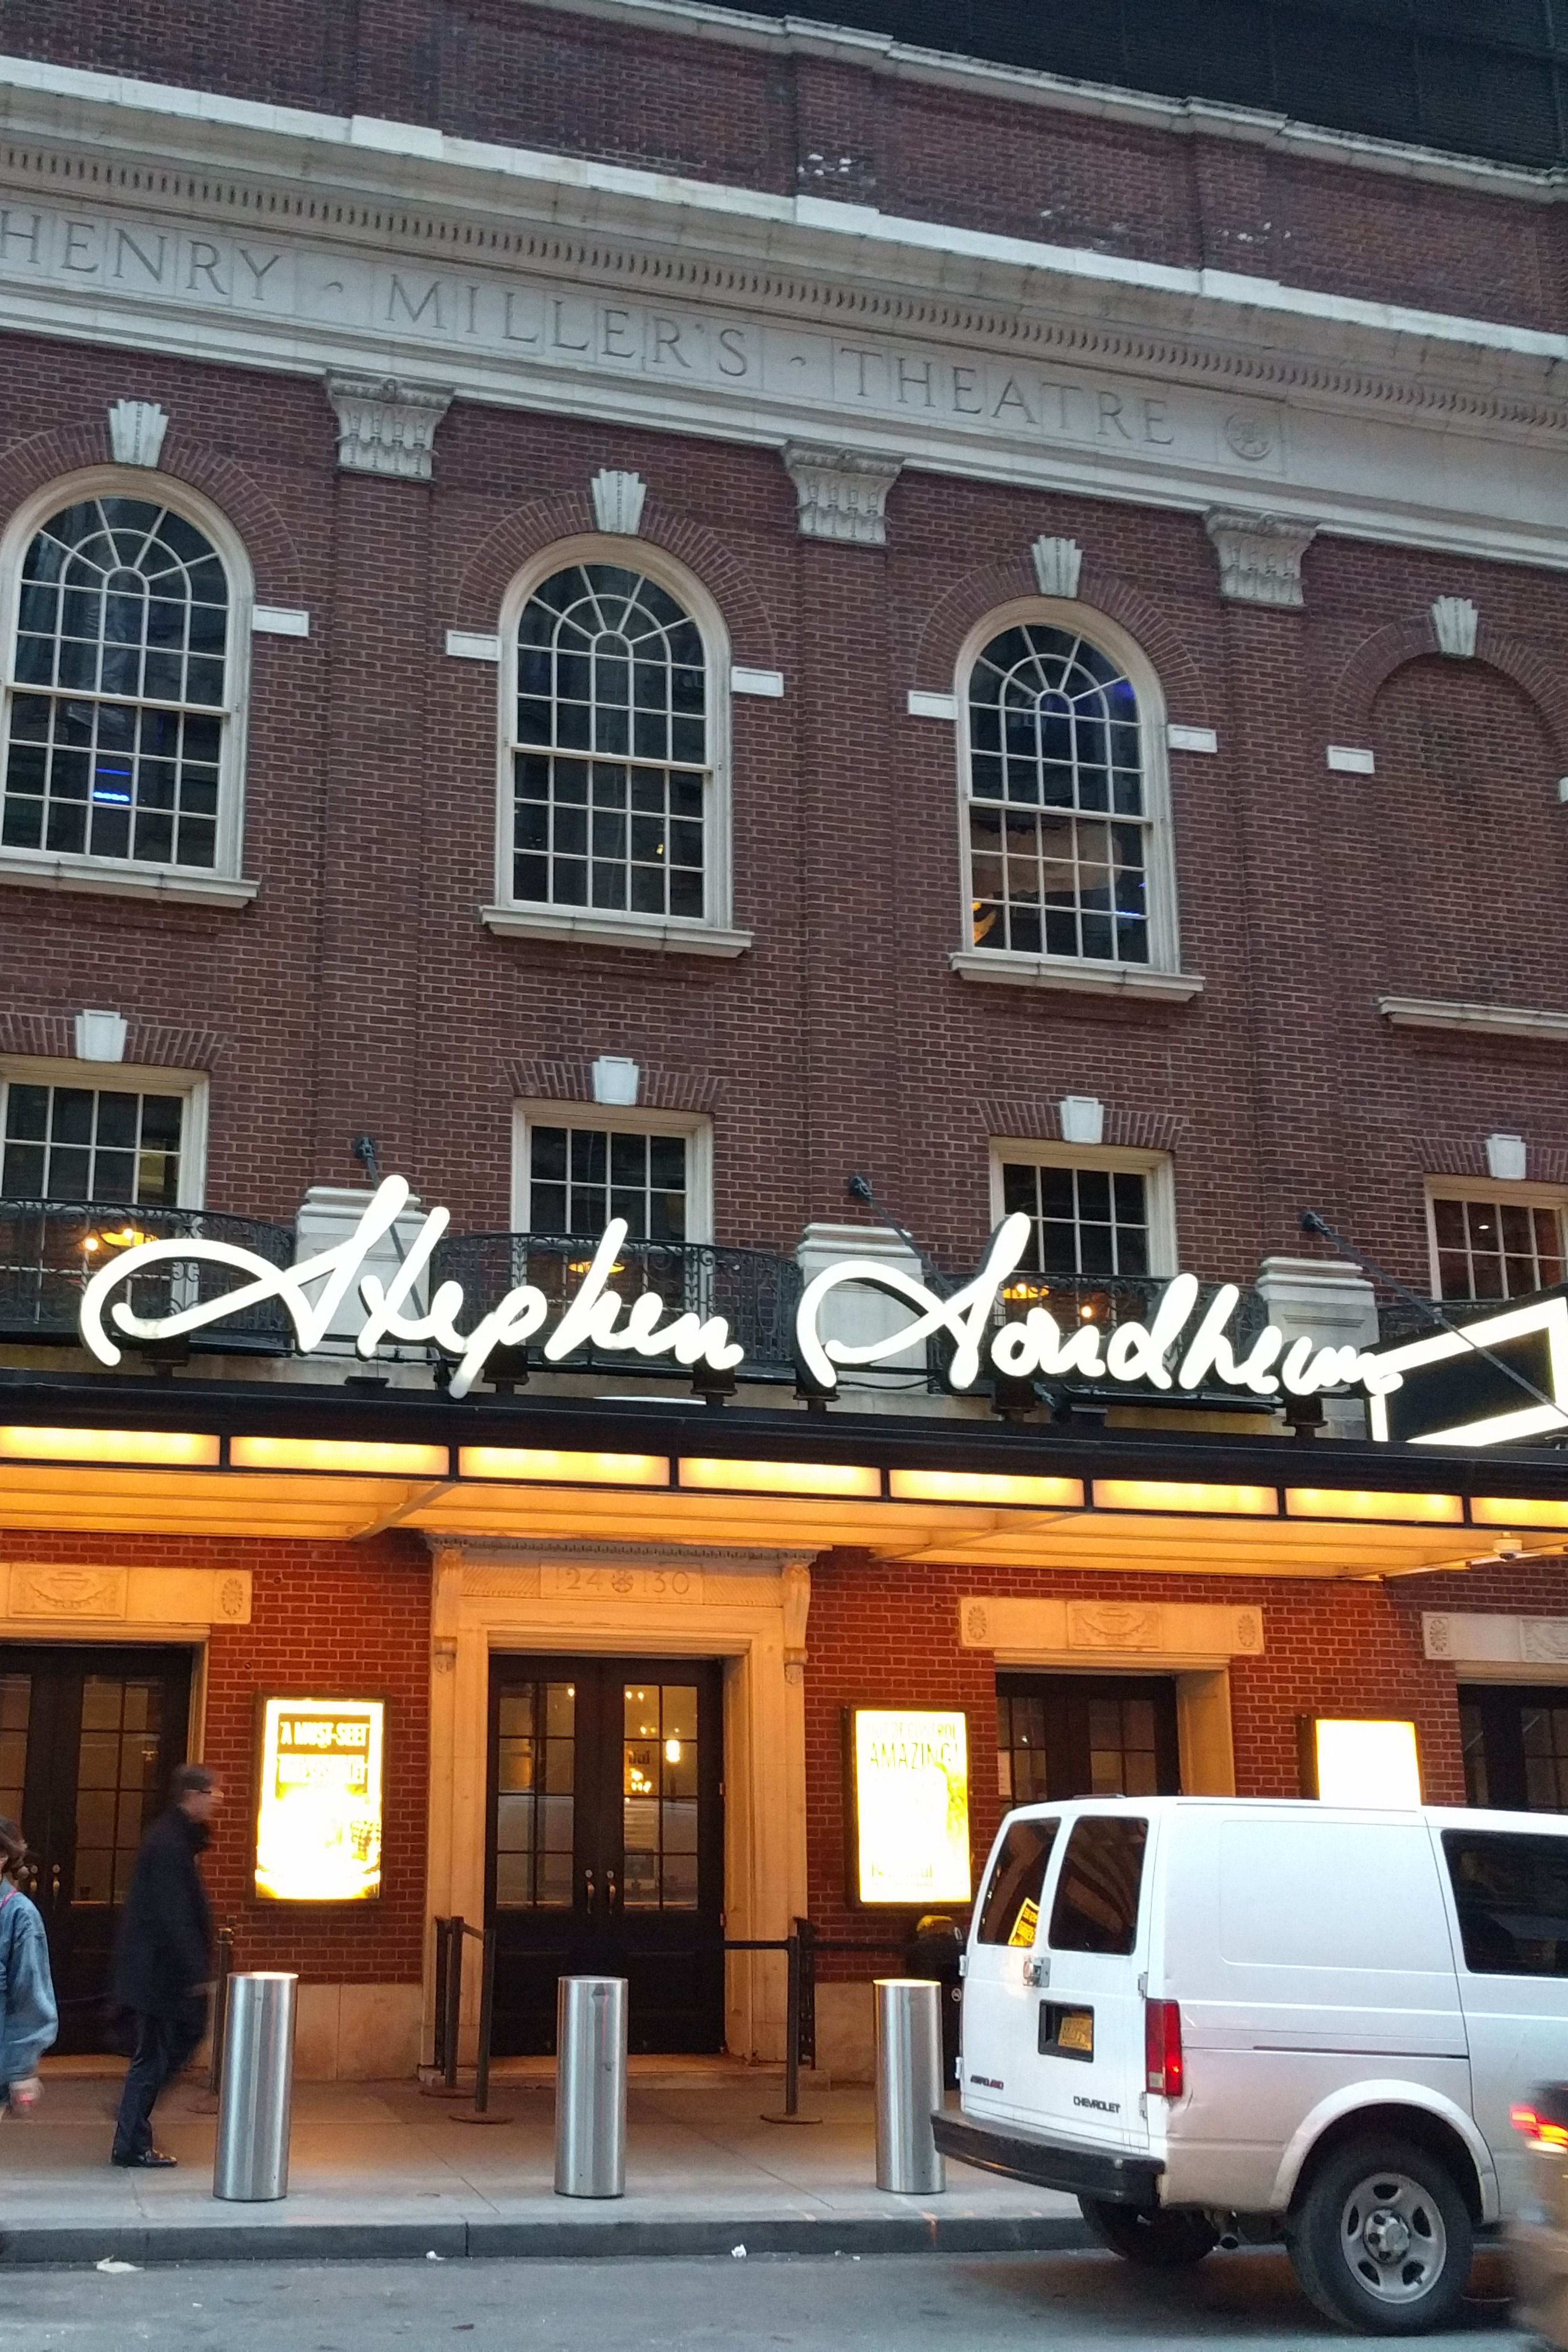 New York City, NY > Stephen Sondheim Theatre, Formerly The